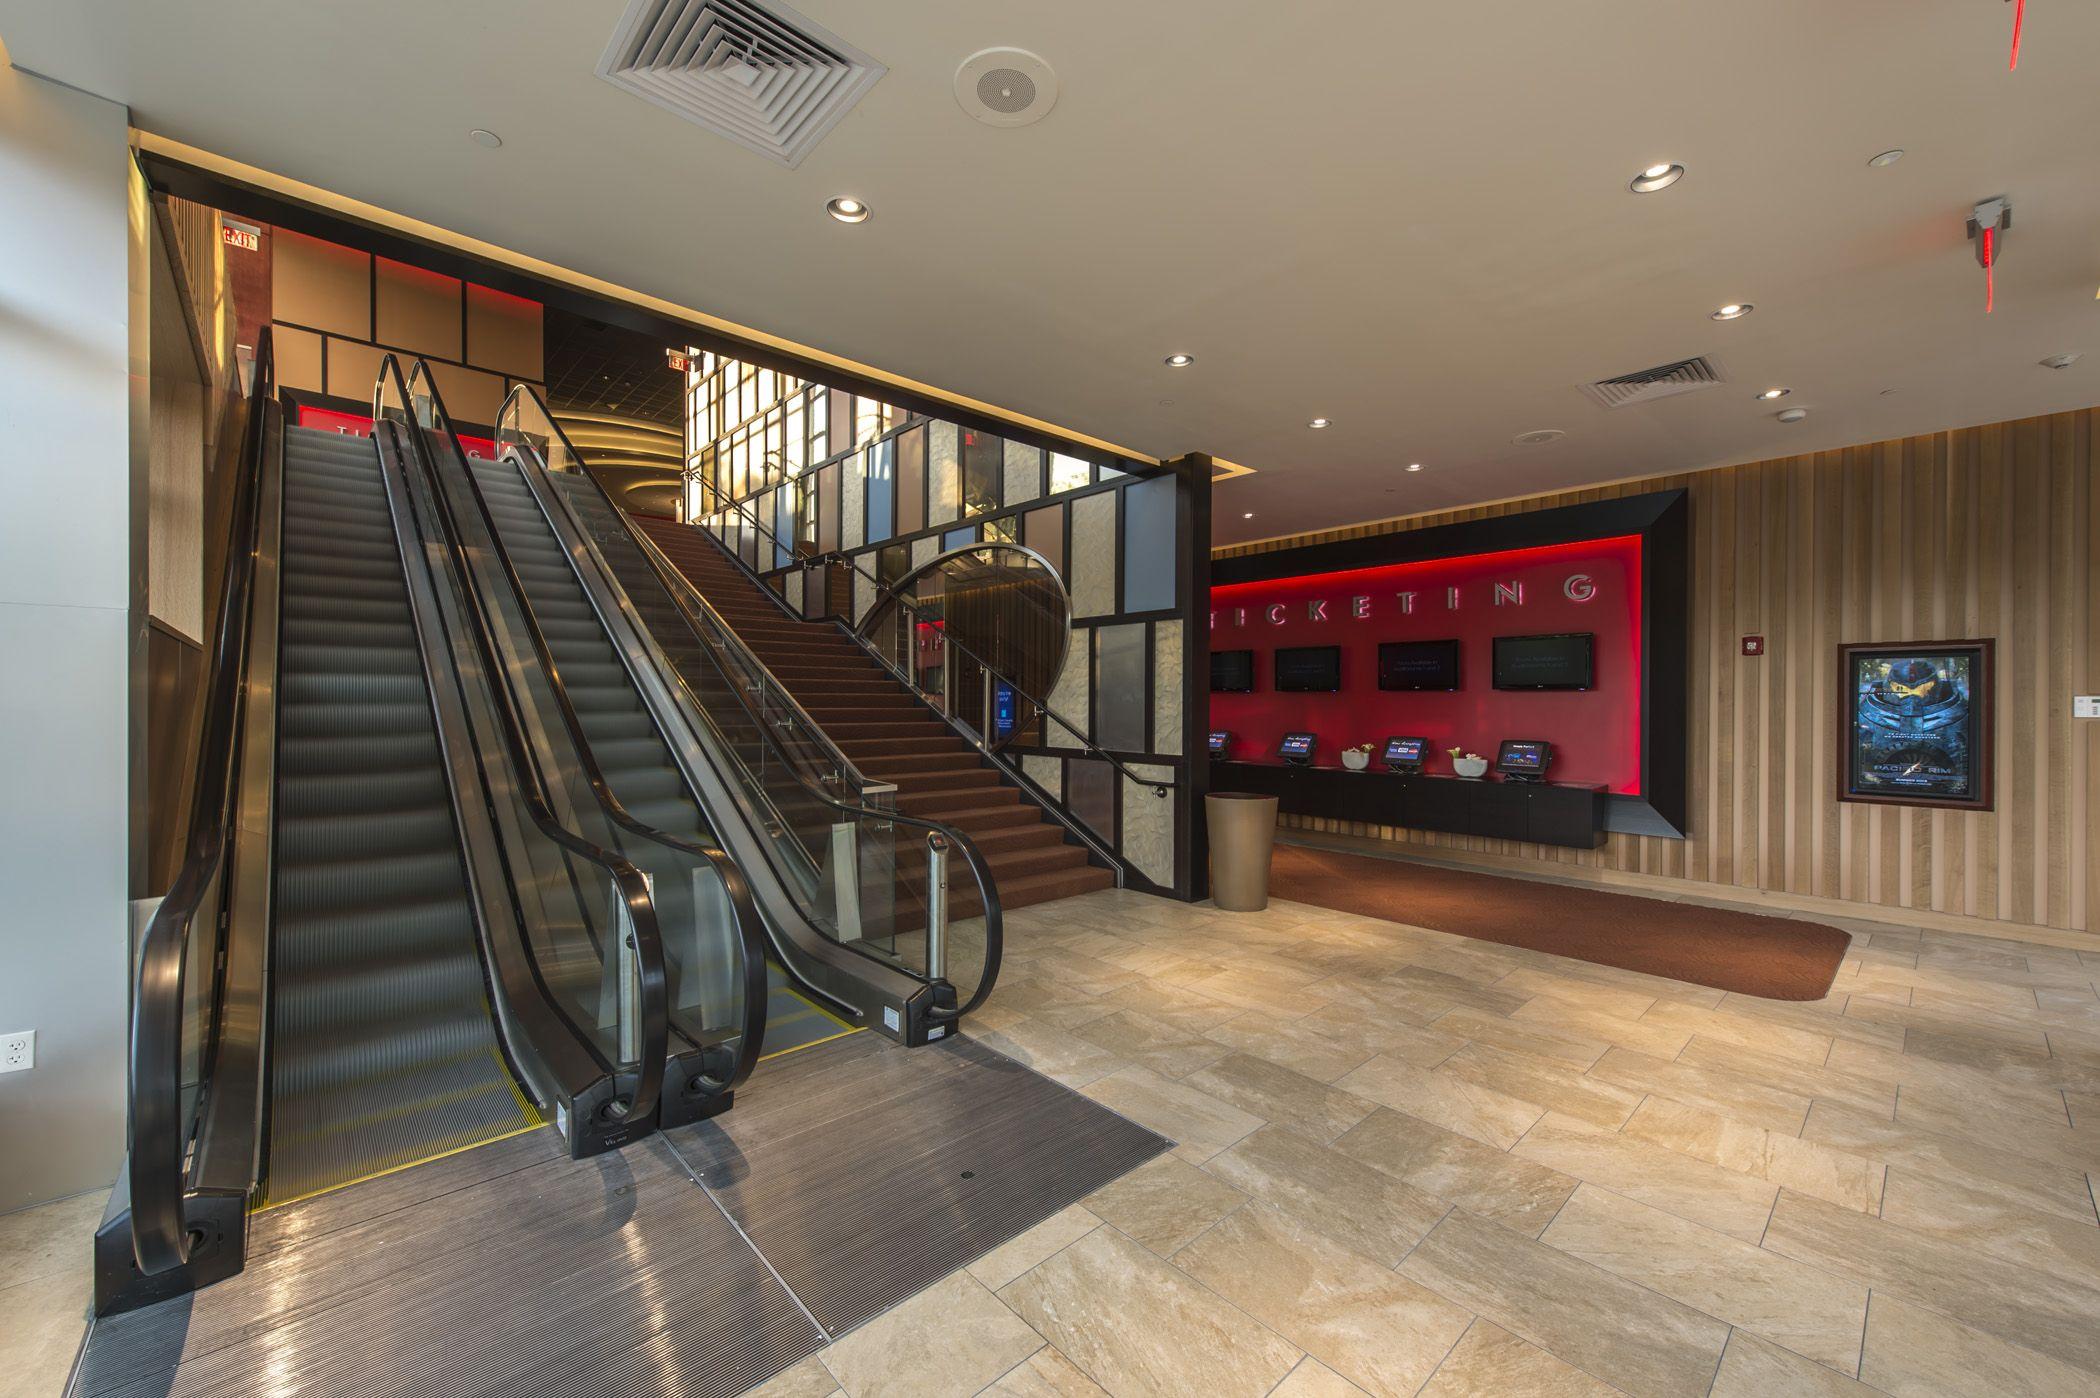 Cinema De Lux, Chestnut Hill, Boston. Designed by Julian Taylor Design Associates for National Amusements USA.